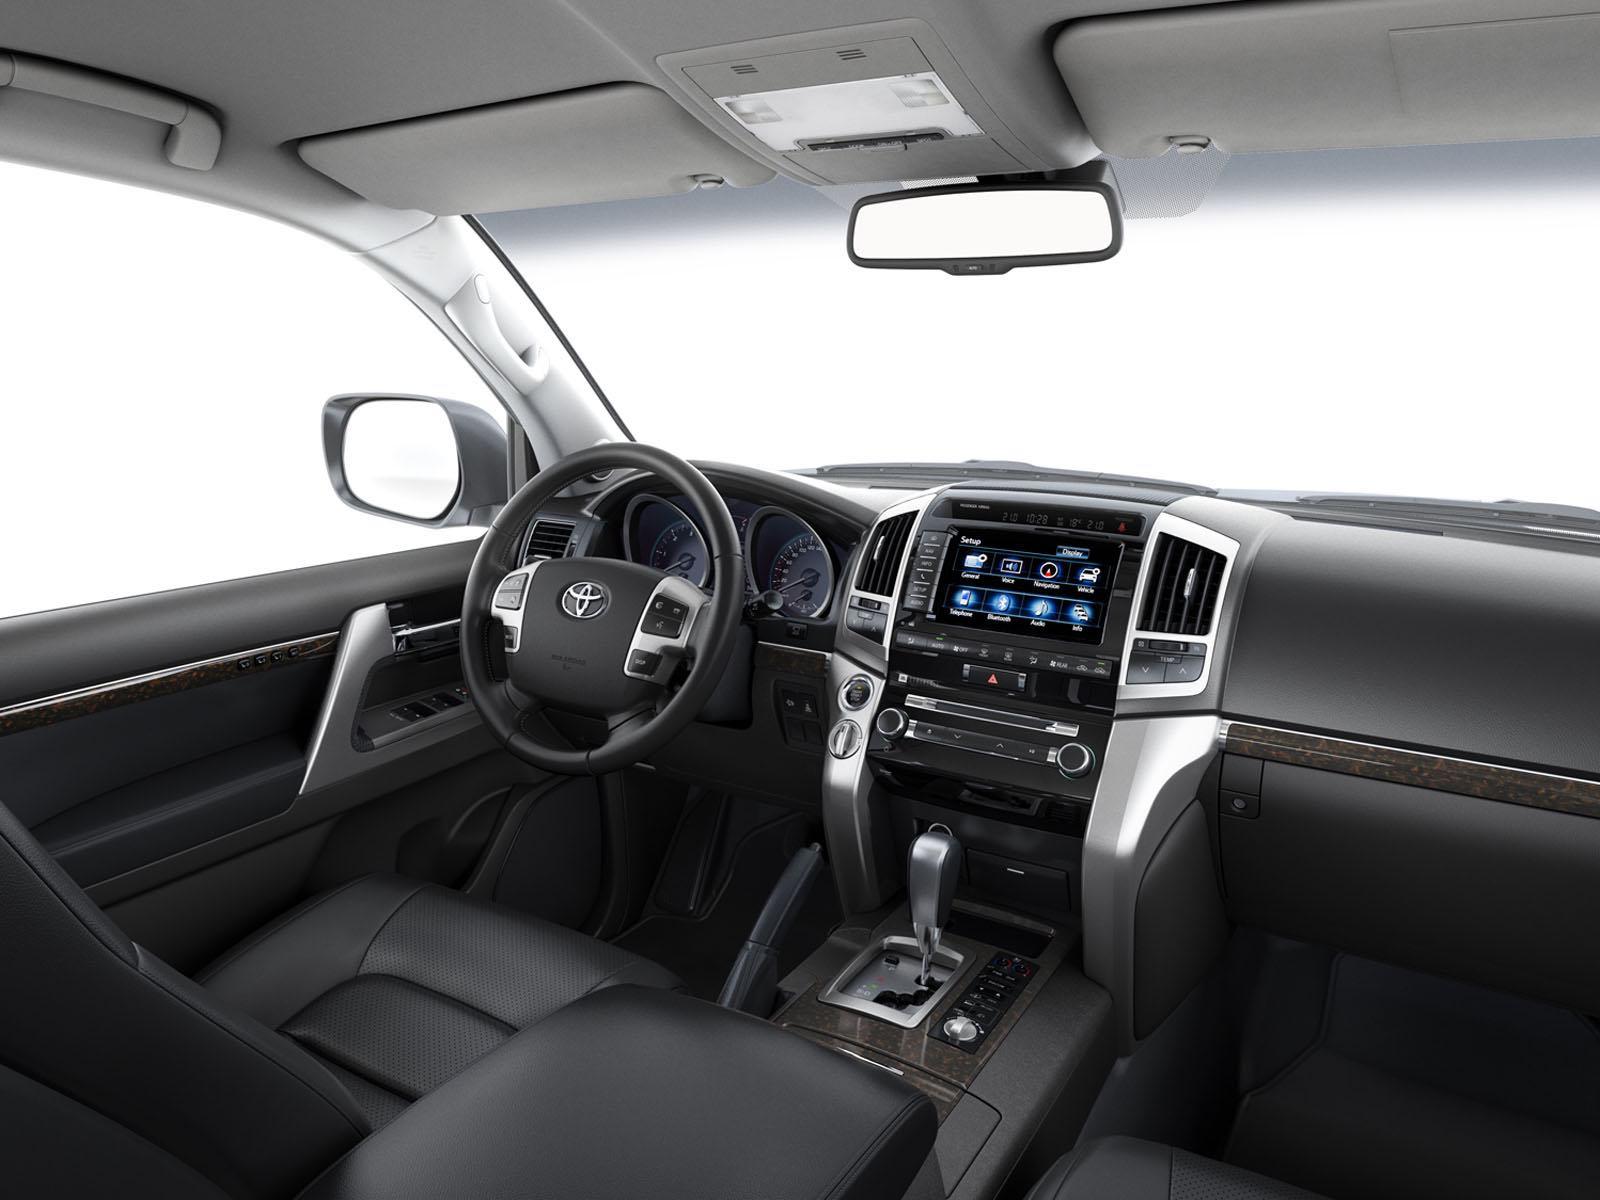 The Land Cruiser V8 Story 4x4 Cars Toyota Uk 300 2015 Car Interior Dashboard